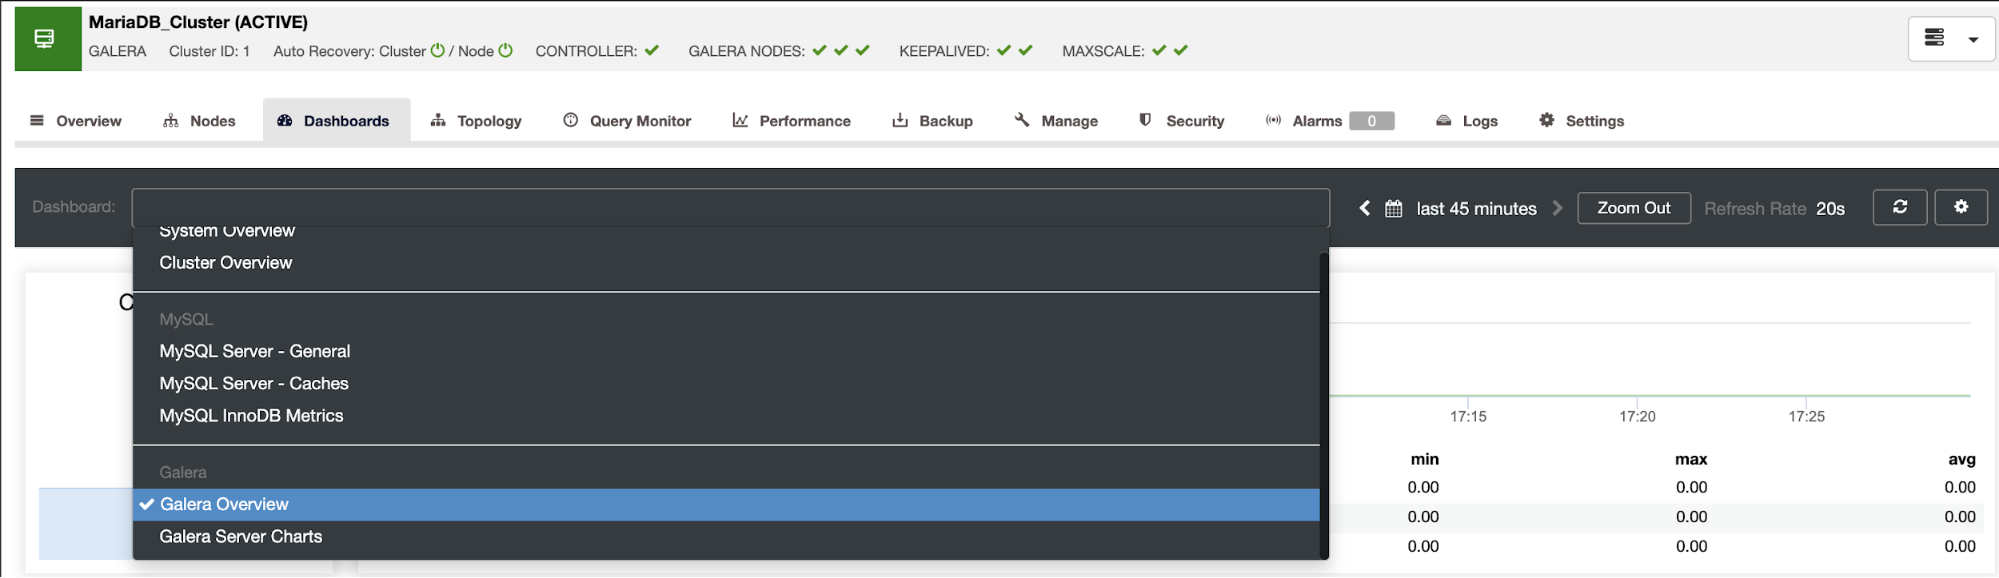 MariaDB Server & Cluster Monitoring